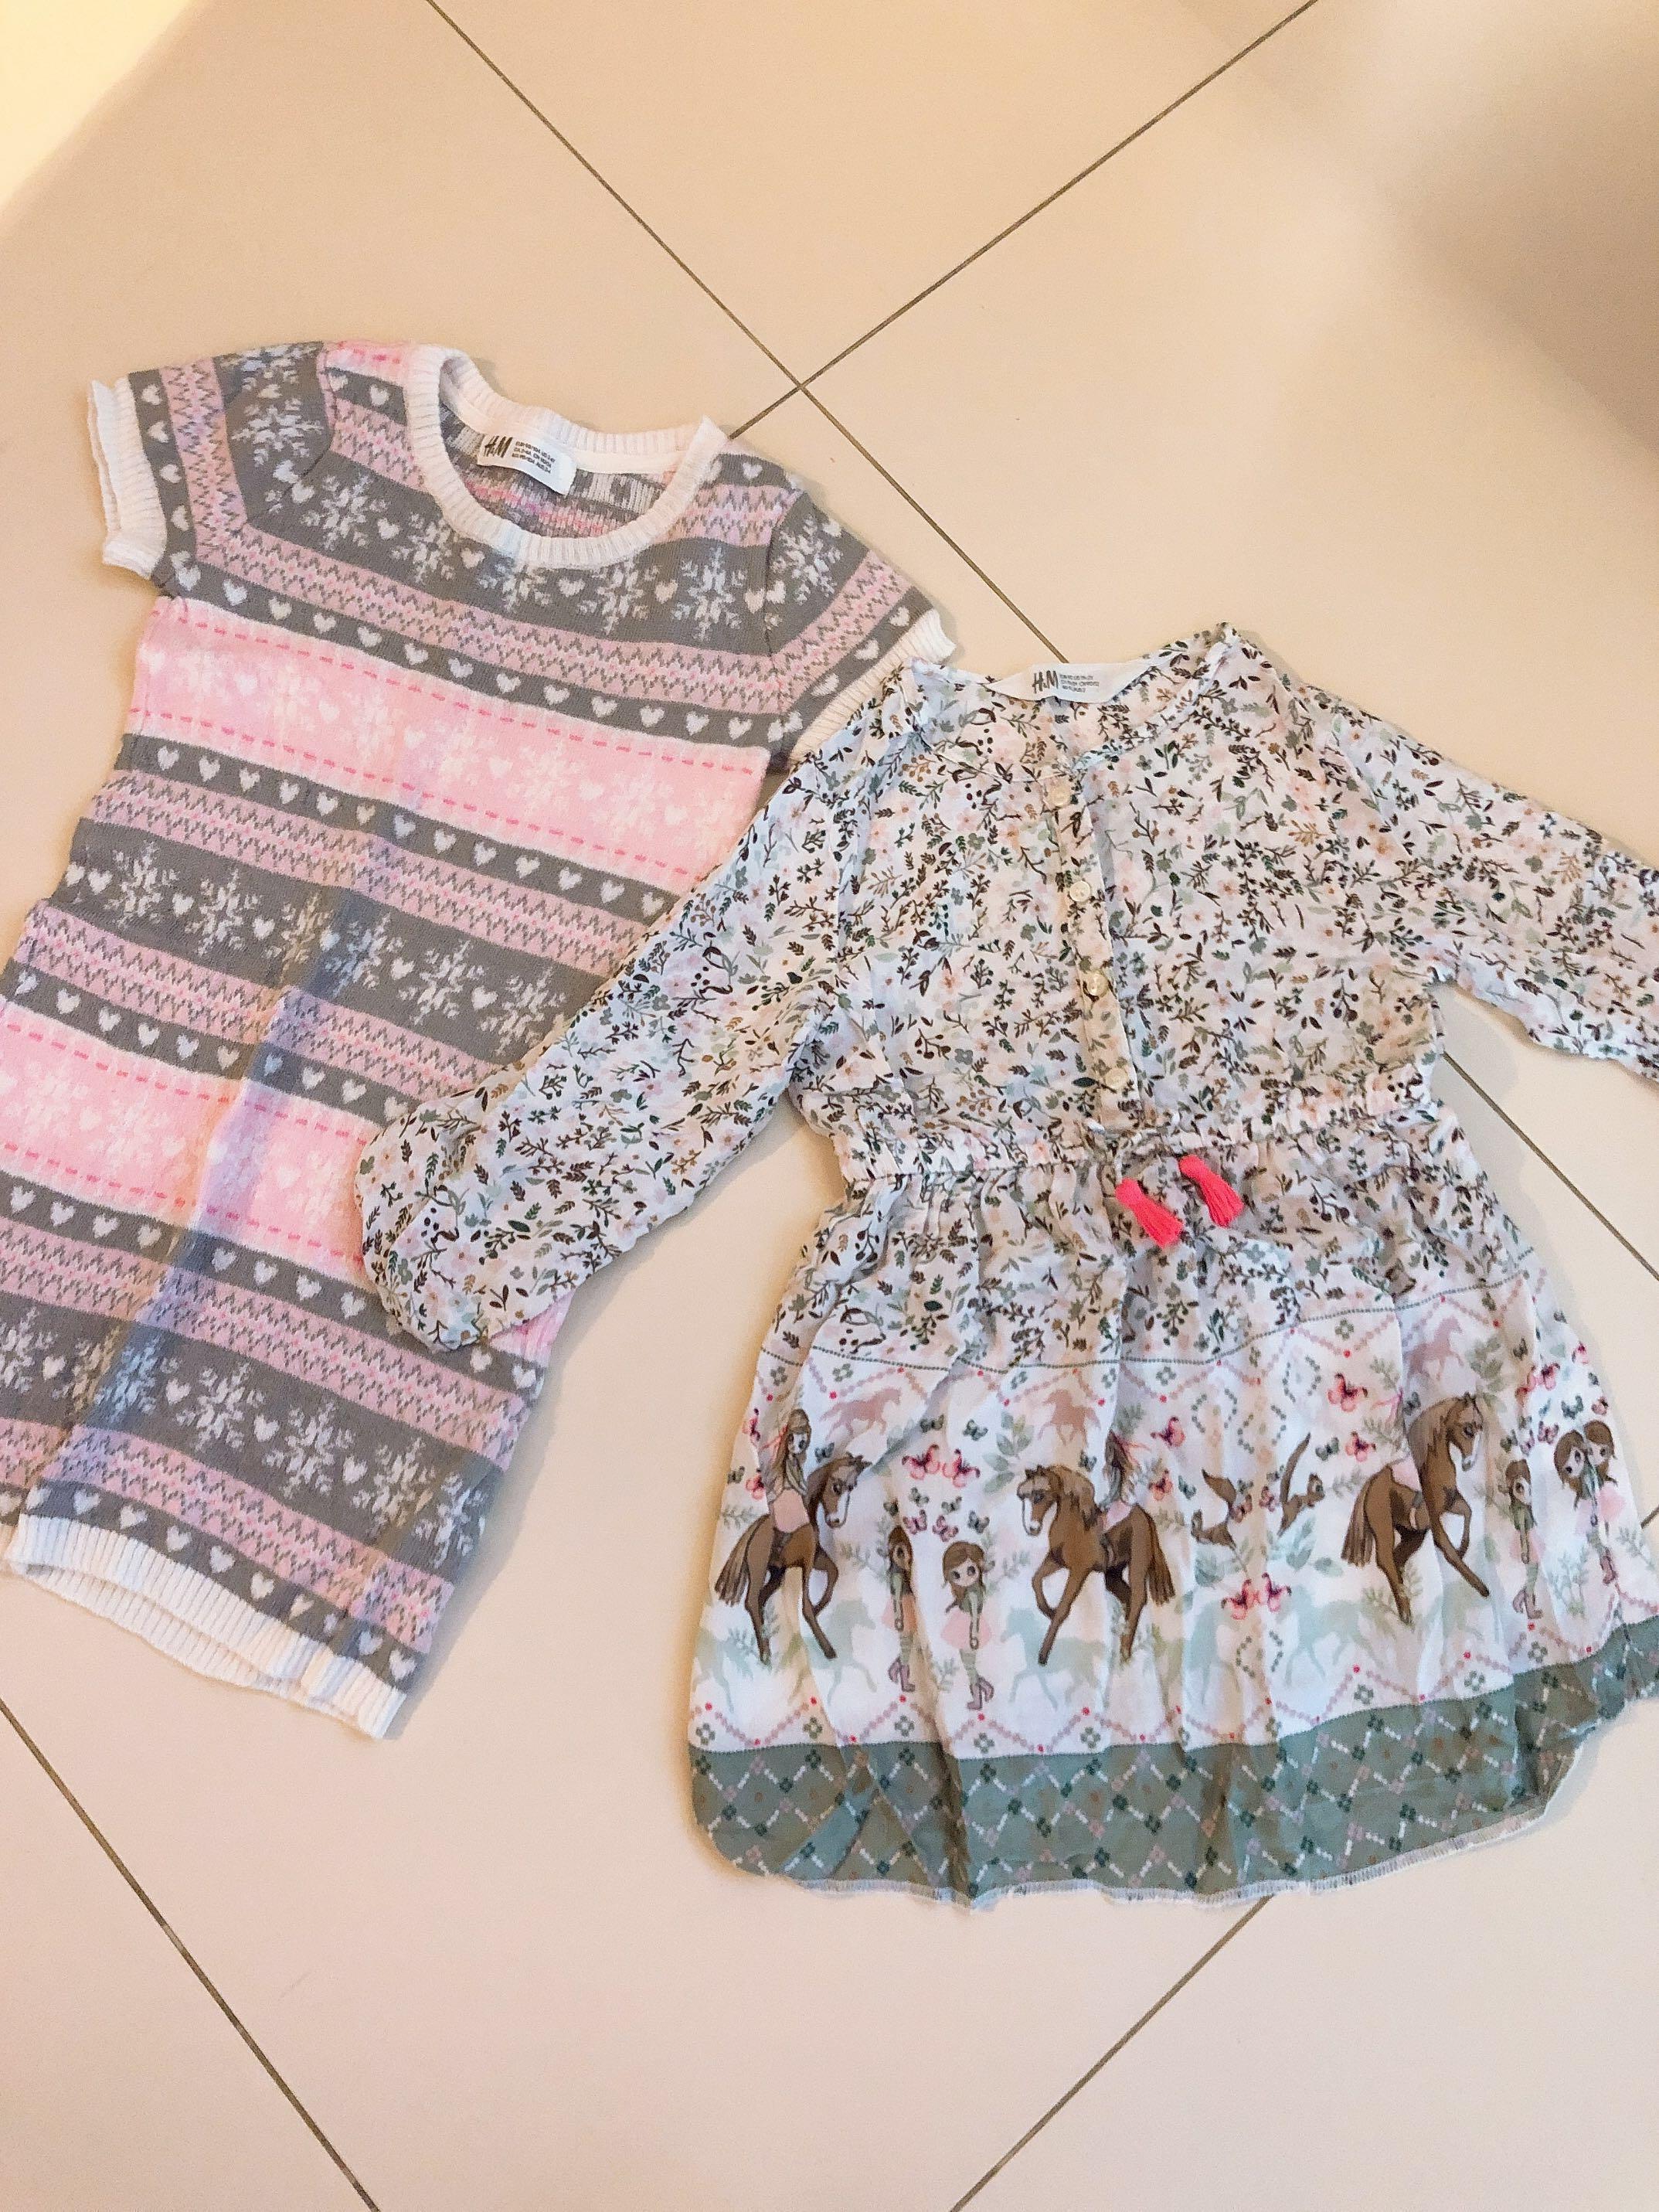 17fc3cb2c SALE! H&M Bohemian Girls 2Pcs Dress Set $20, Babies & Kids, Girls ...